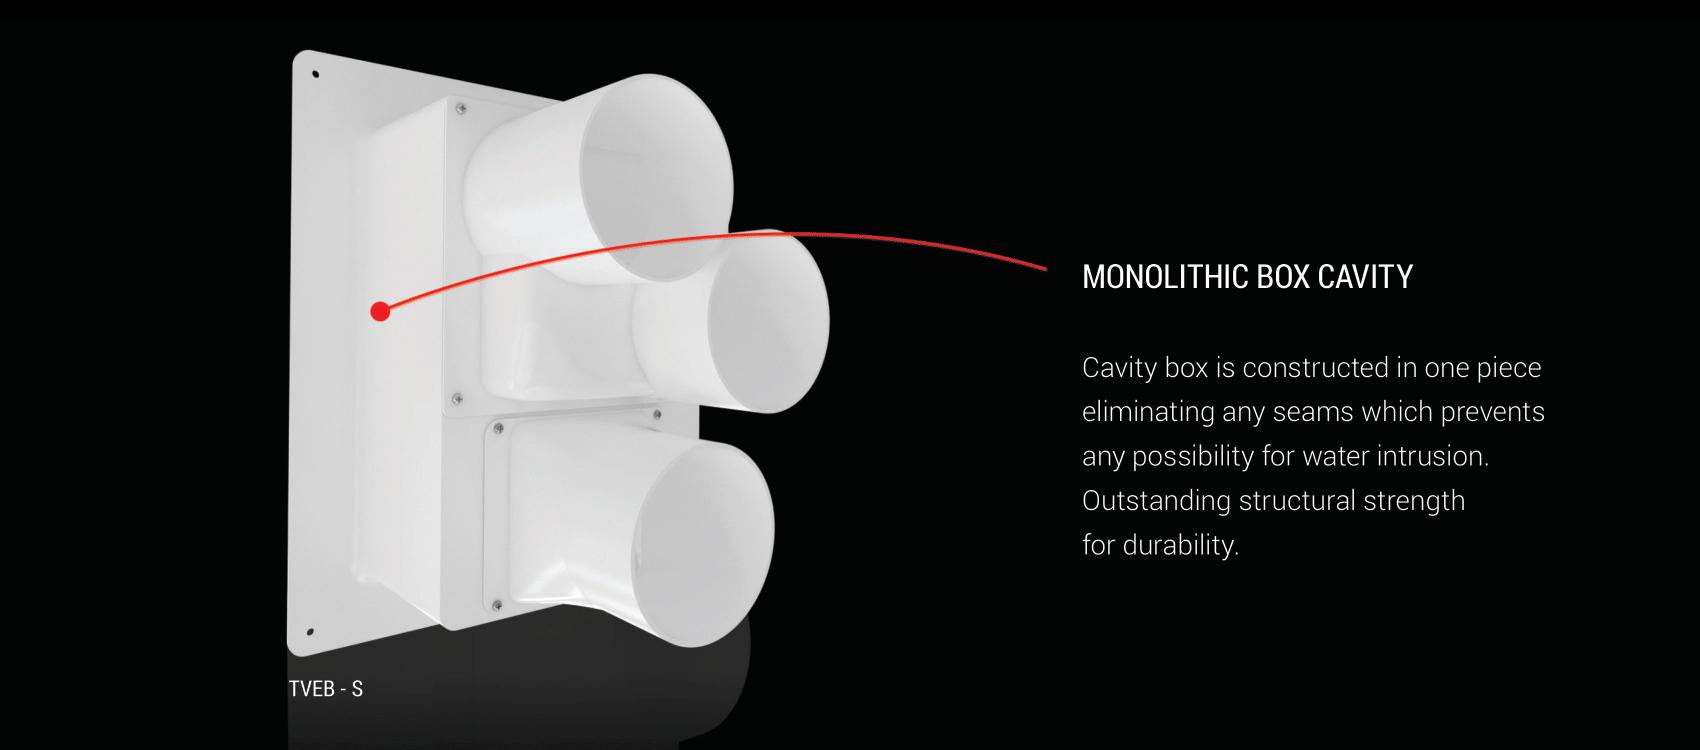 Monolithic Box Cavity